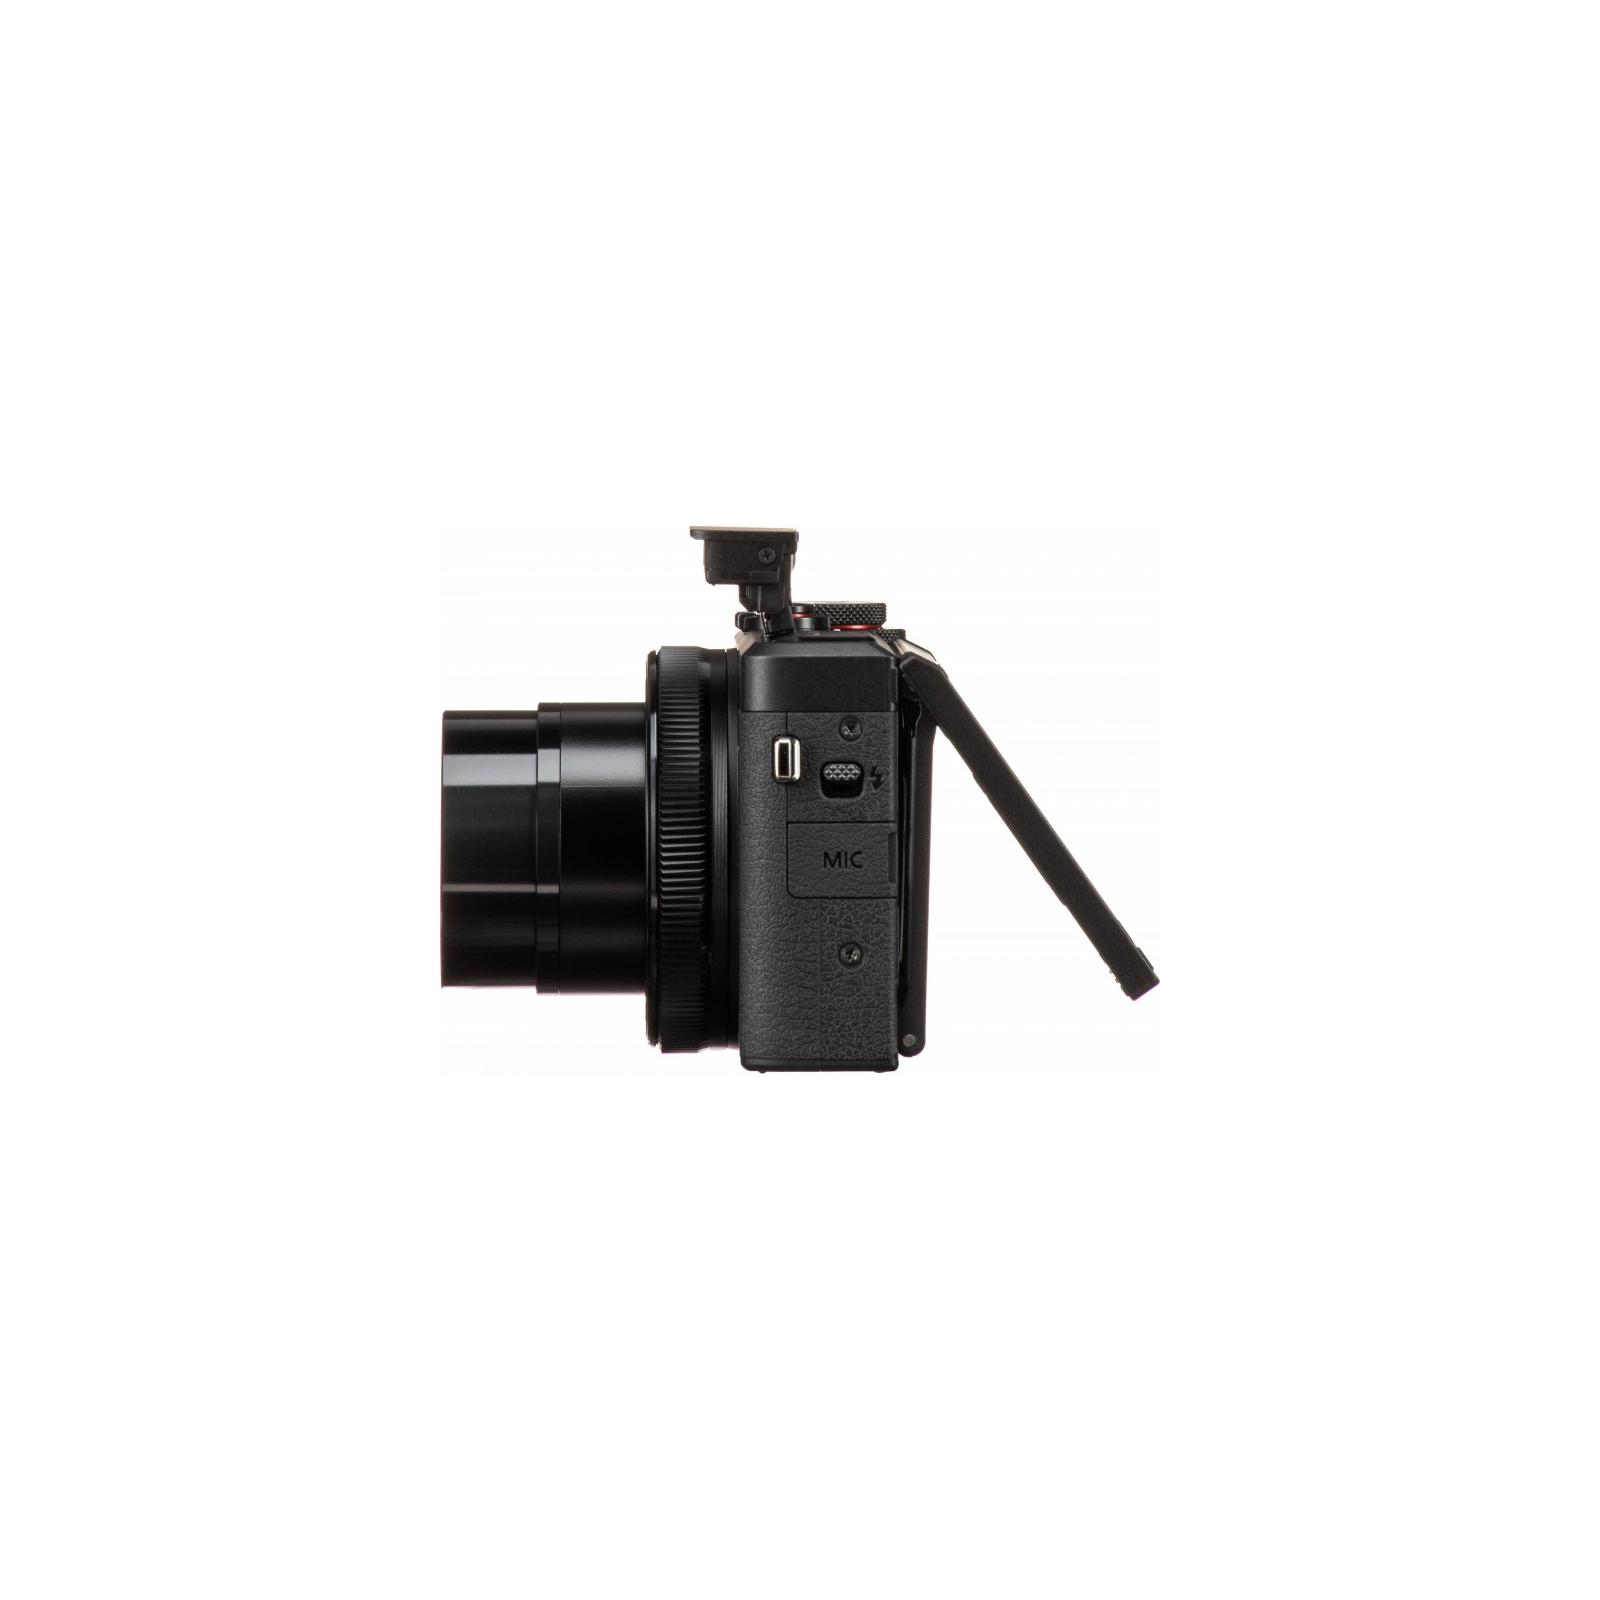 Цифровой фотоаппарат Canon Powershot G7 X Mark III Black (3637C013) изображение 9